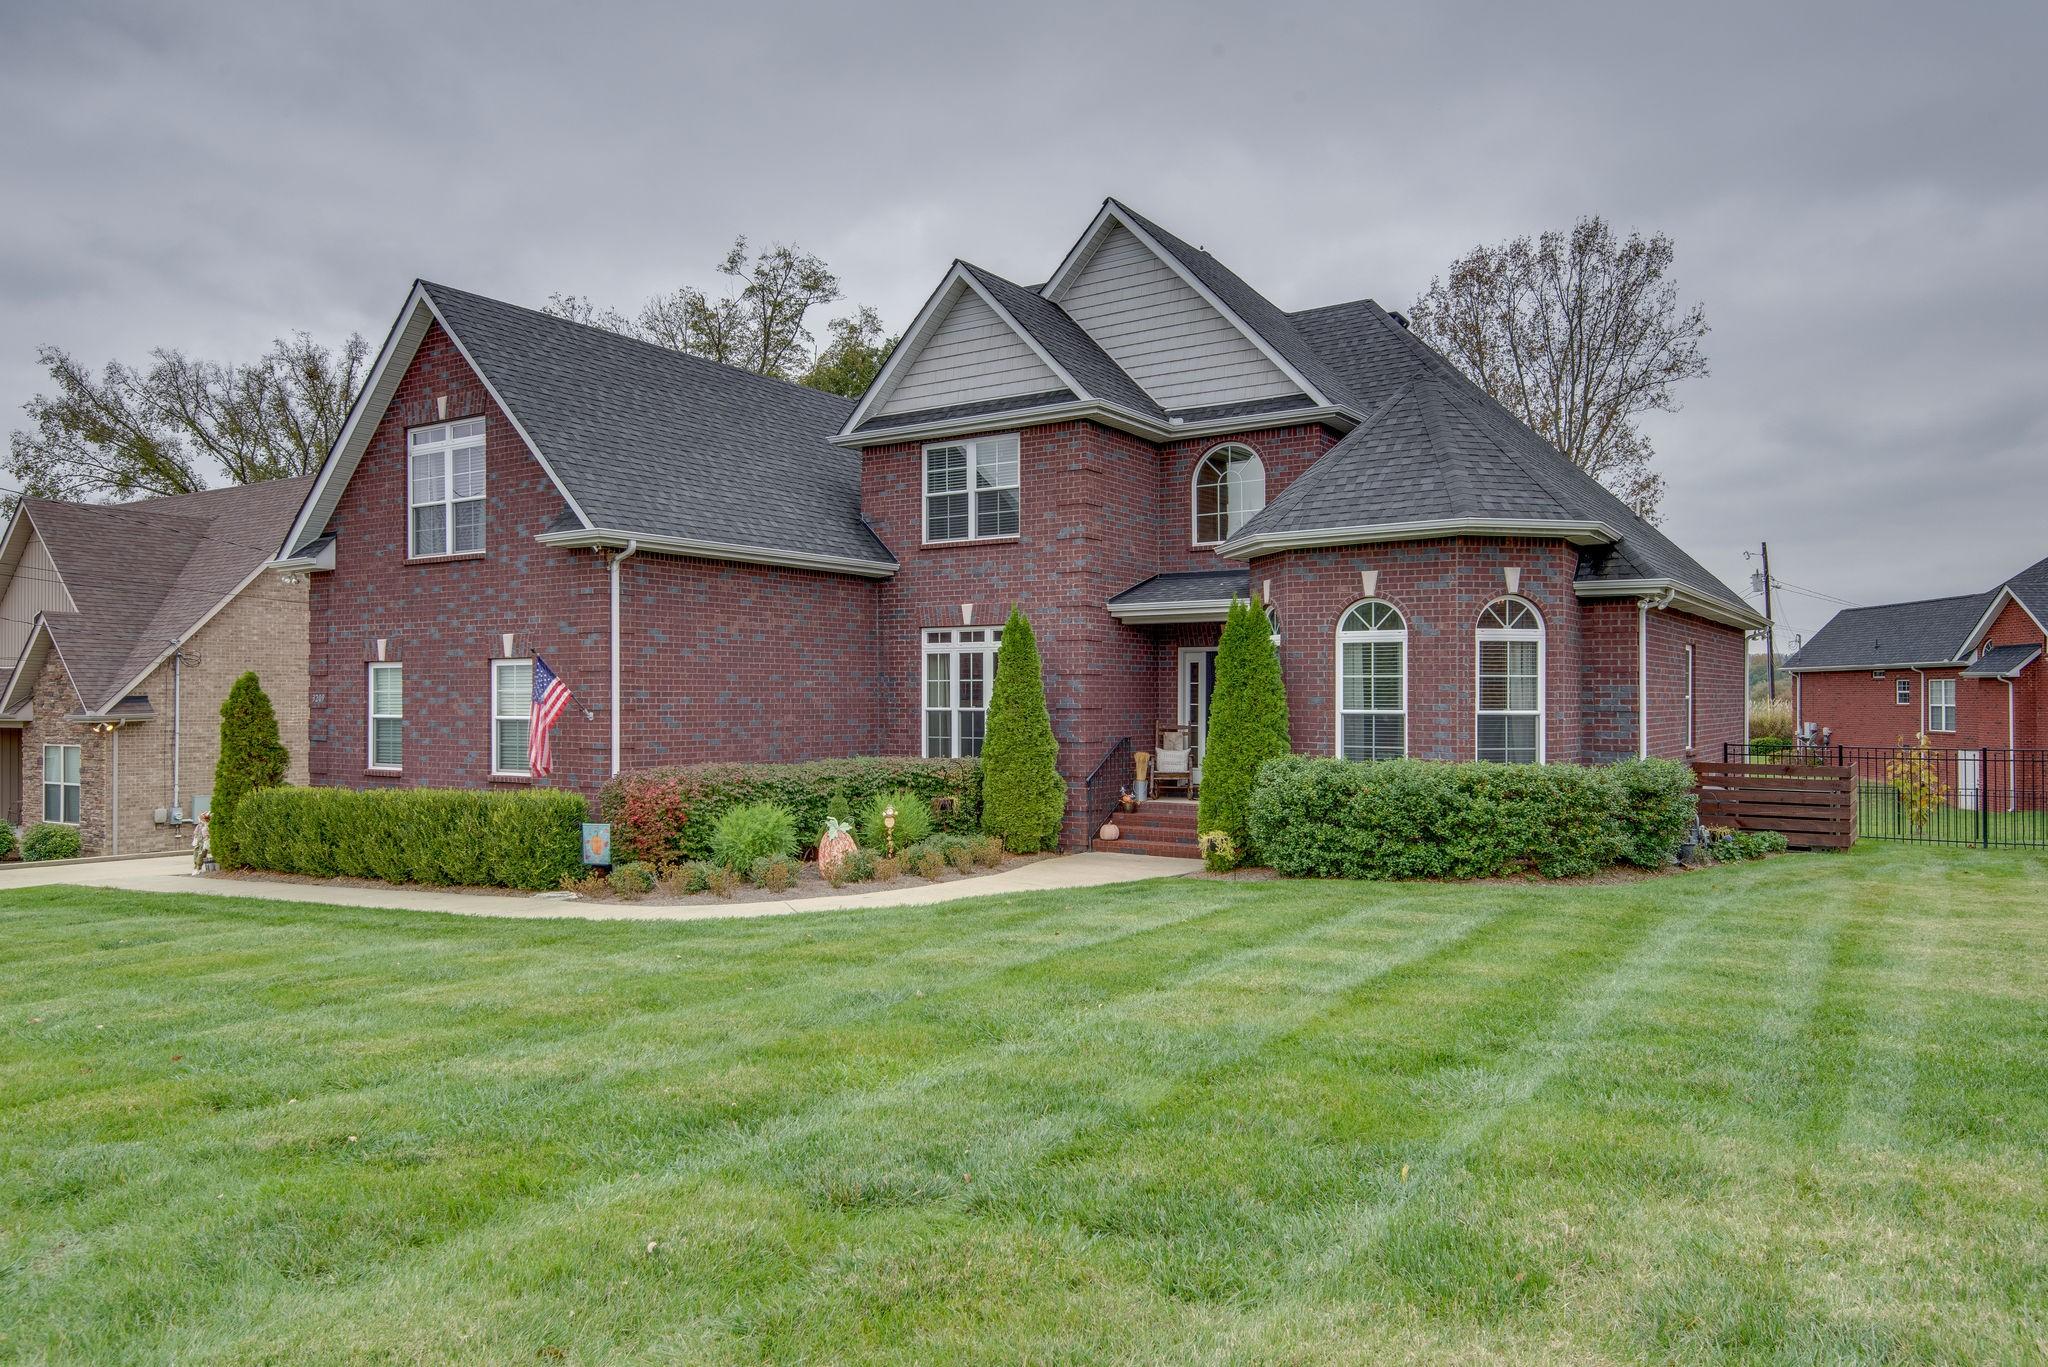 3209 Potts Xing, LA VERGNE, TN 37086 - LA VERGNE, TN real estate listing